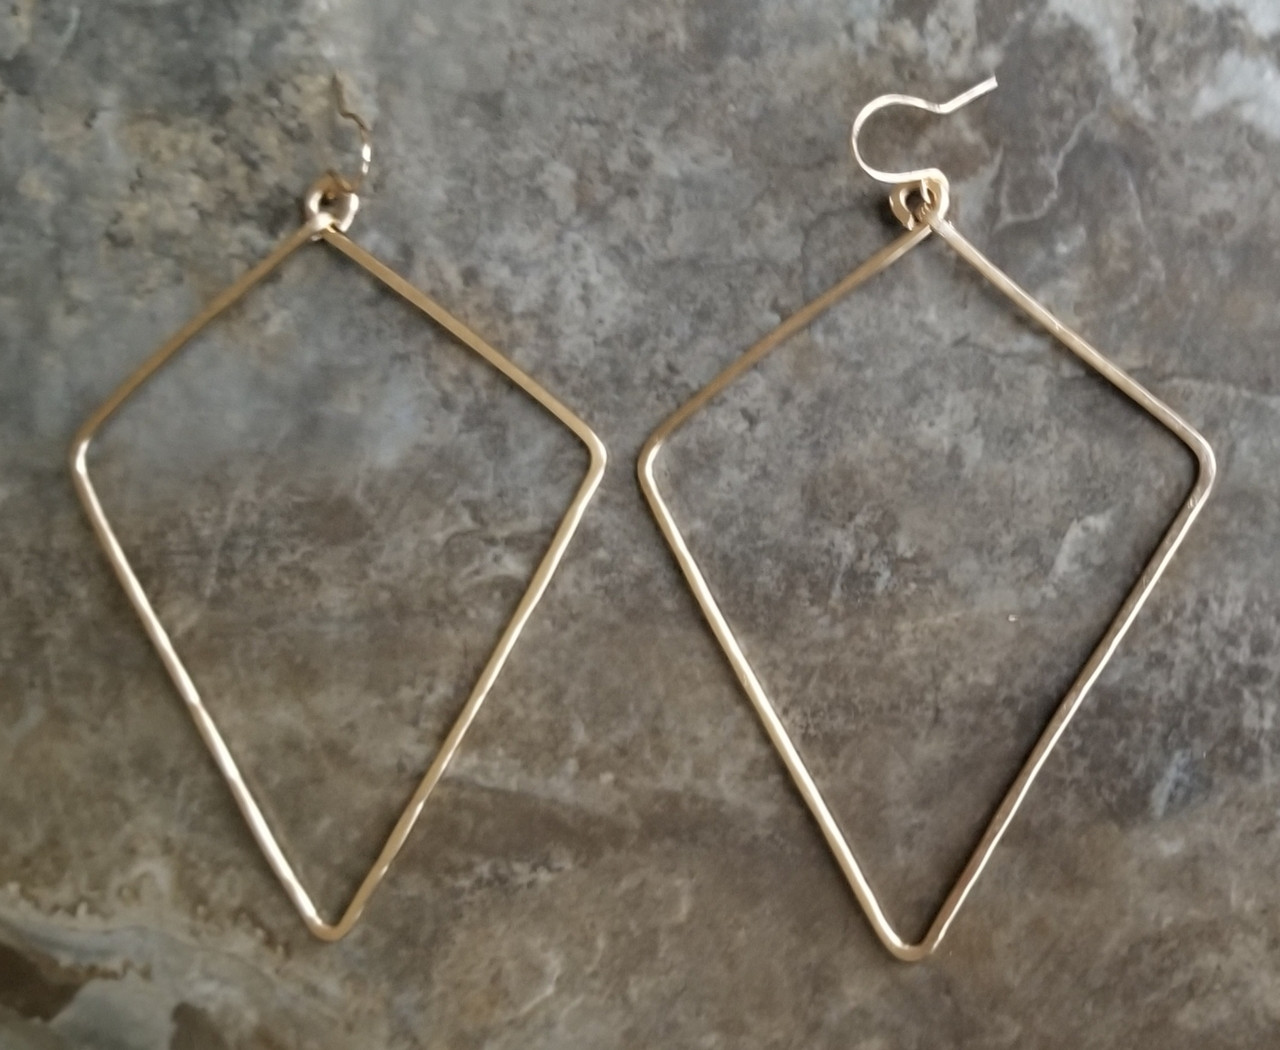 Diamond-shaped Earrings: Lrg